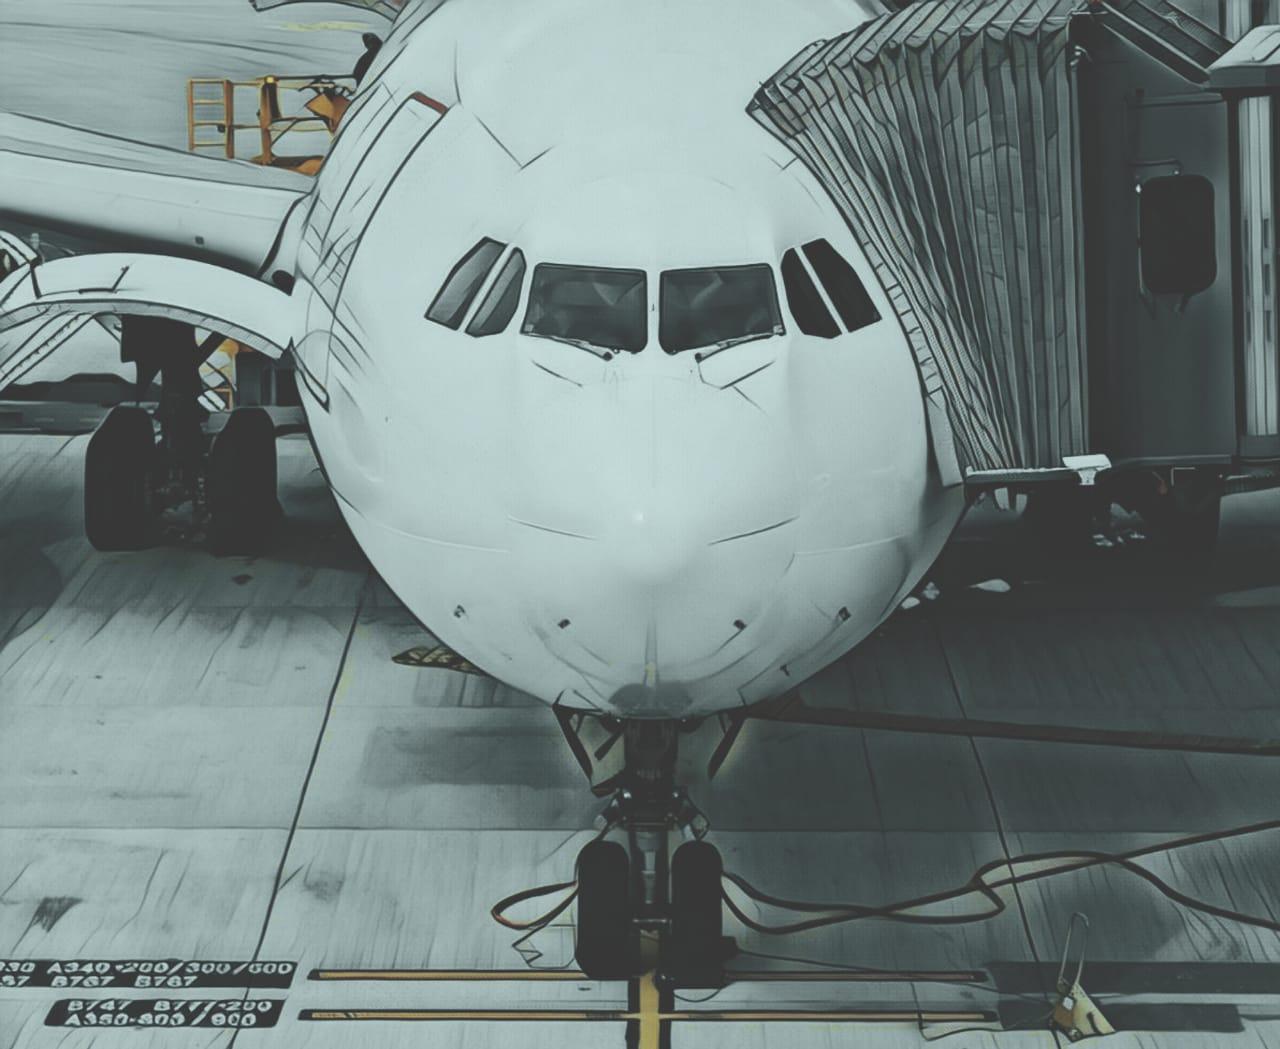 https: img.okeinfo.net content 2019 04 26 320 2048487 terminal-2f-bandara-soetta-khusus-penerbangan-murah-PBmoYAI3j3.jpg